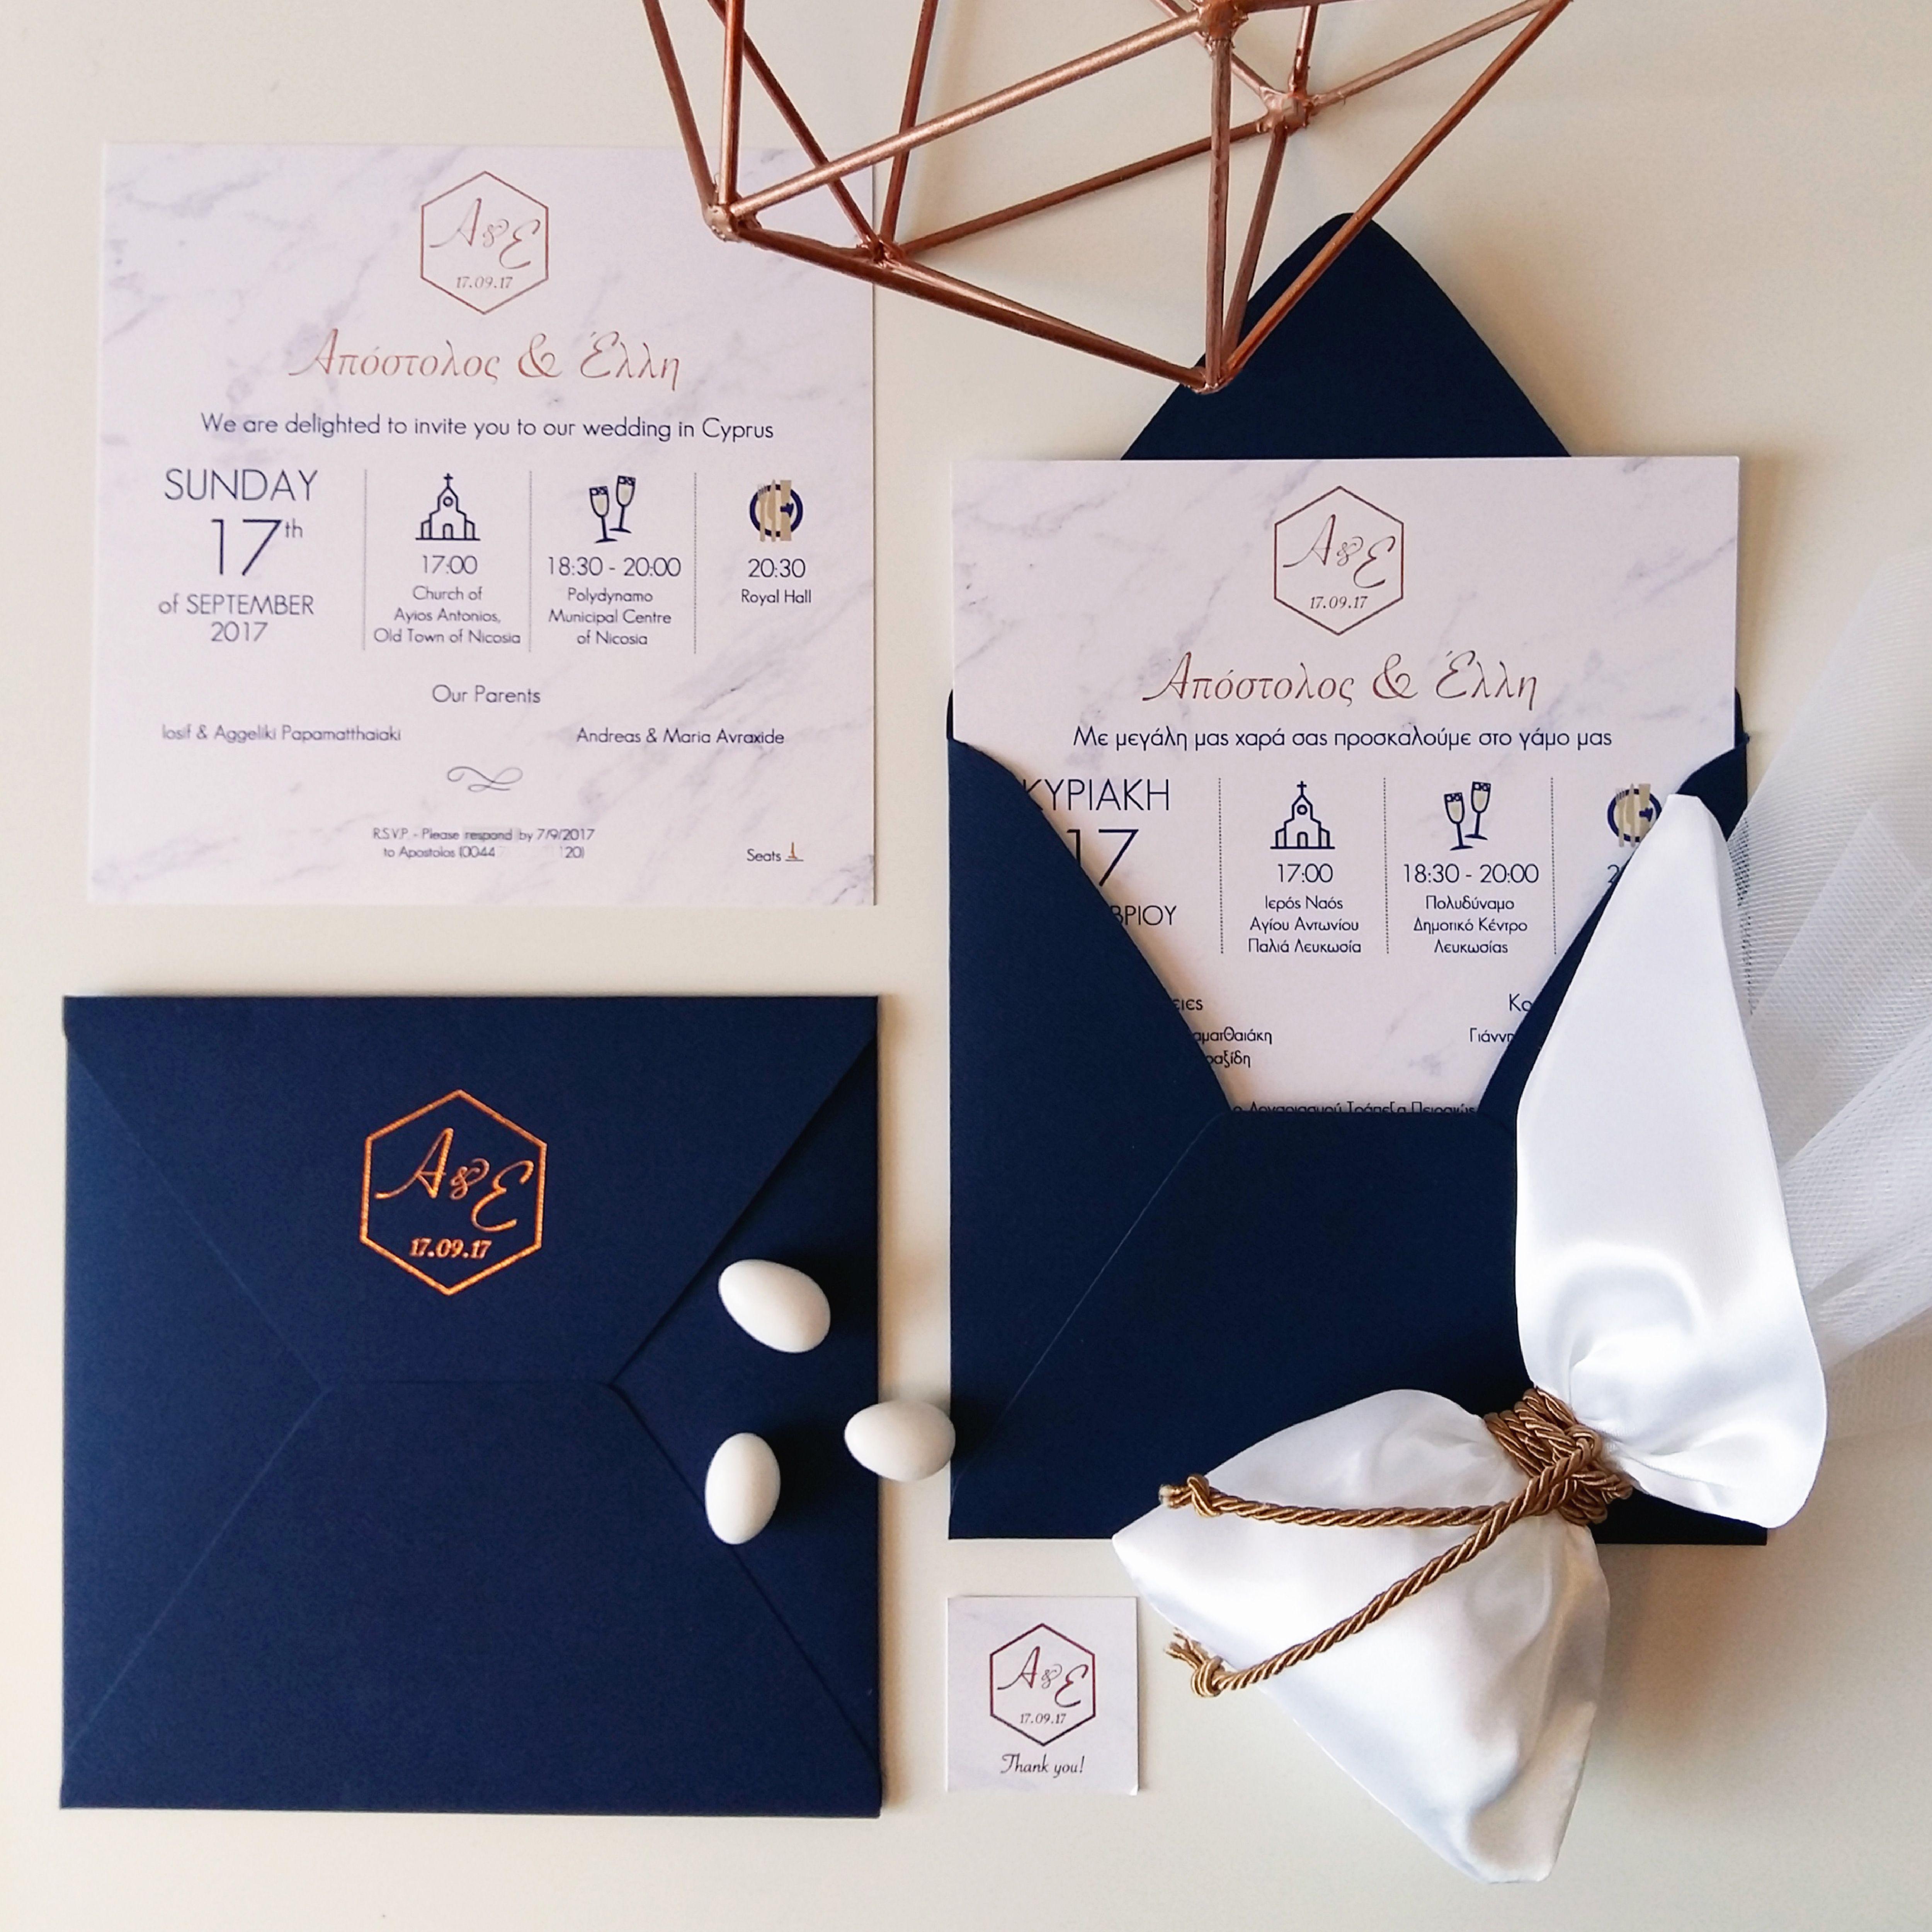 Chic Invitation Royal Blue Envelope Copper Foil And Marble Chic Invitation Blue Invitation Blue And Copper